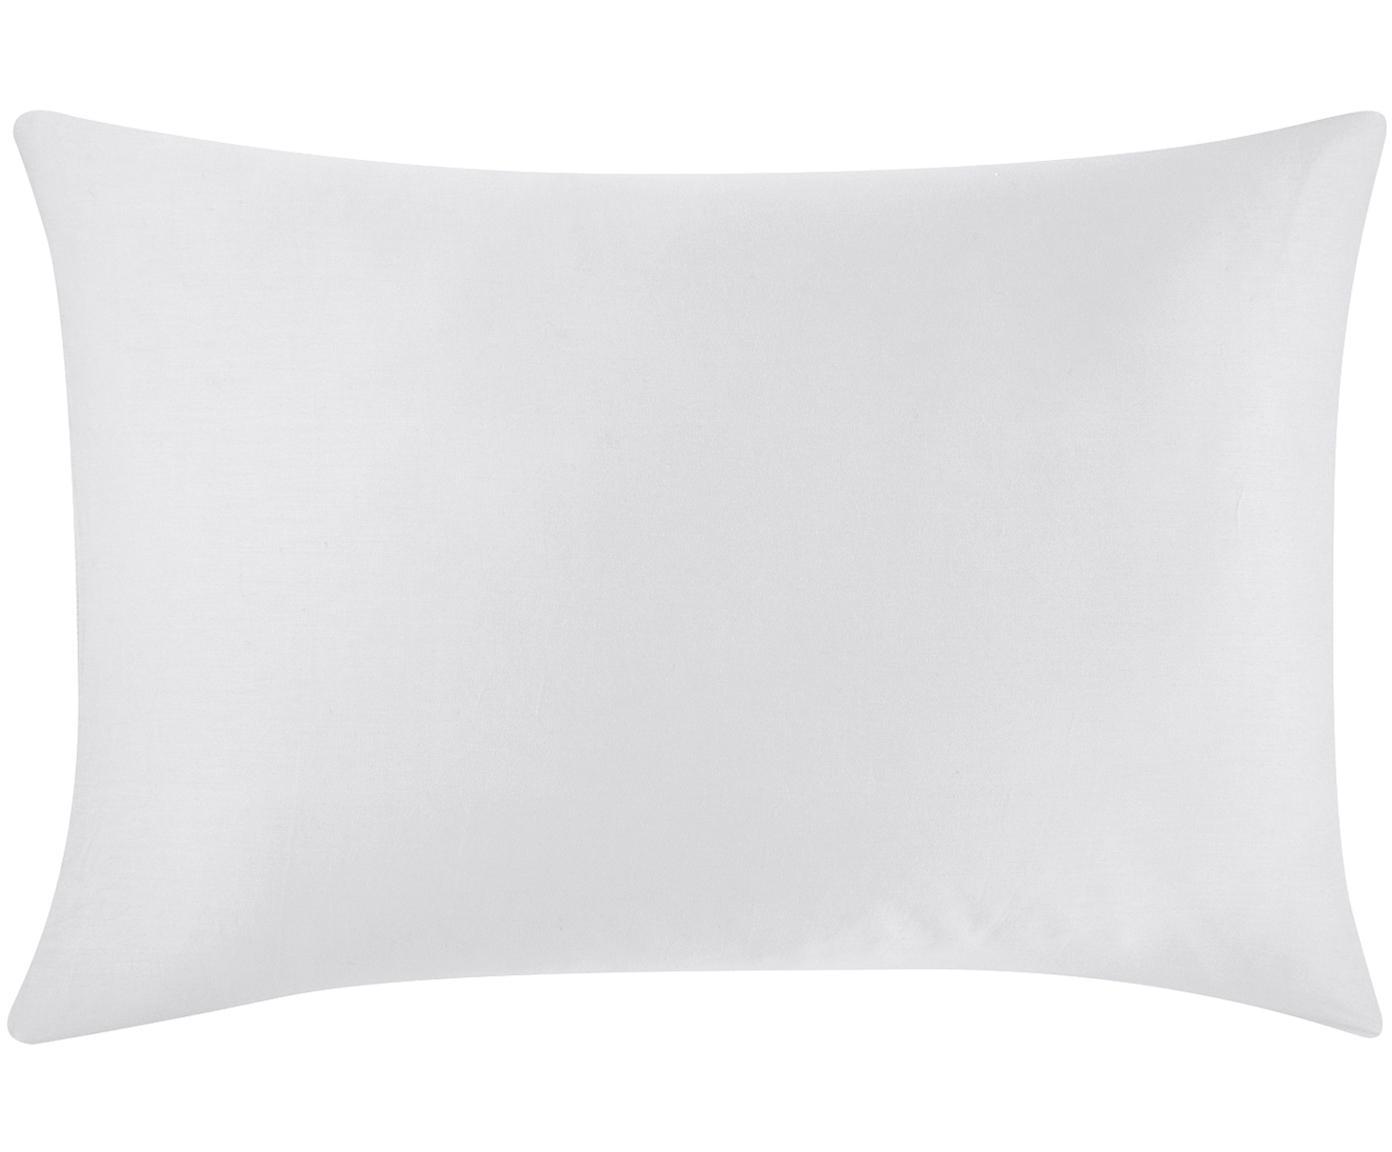 Funda de almohada de satén Comfort, Gris claro, An 50 x L 70 cm